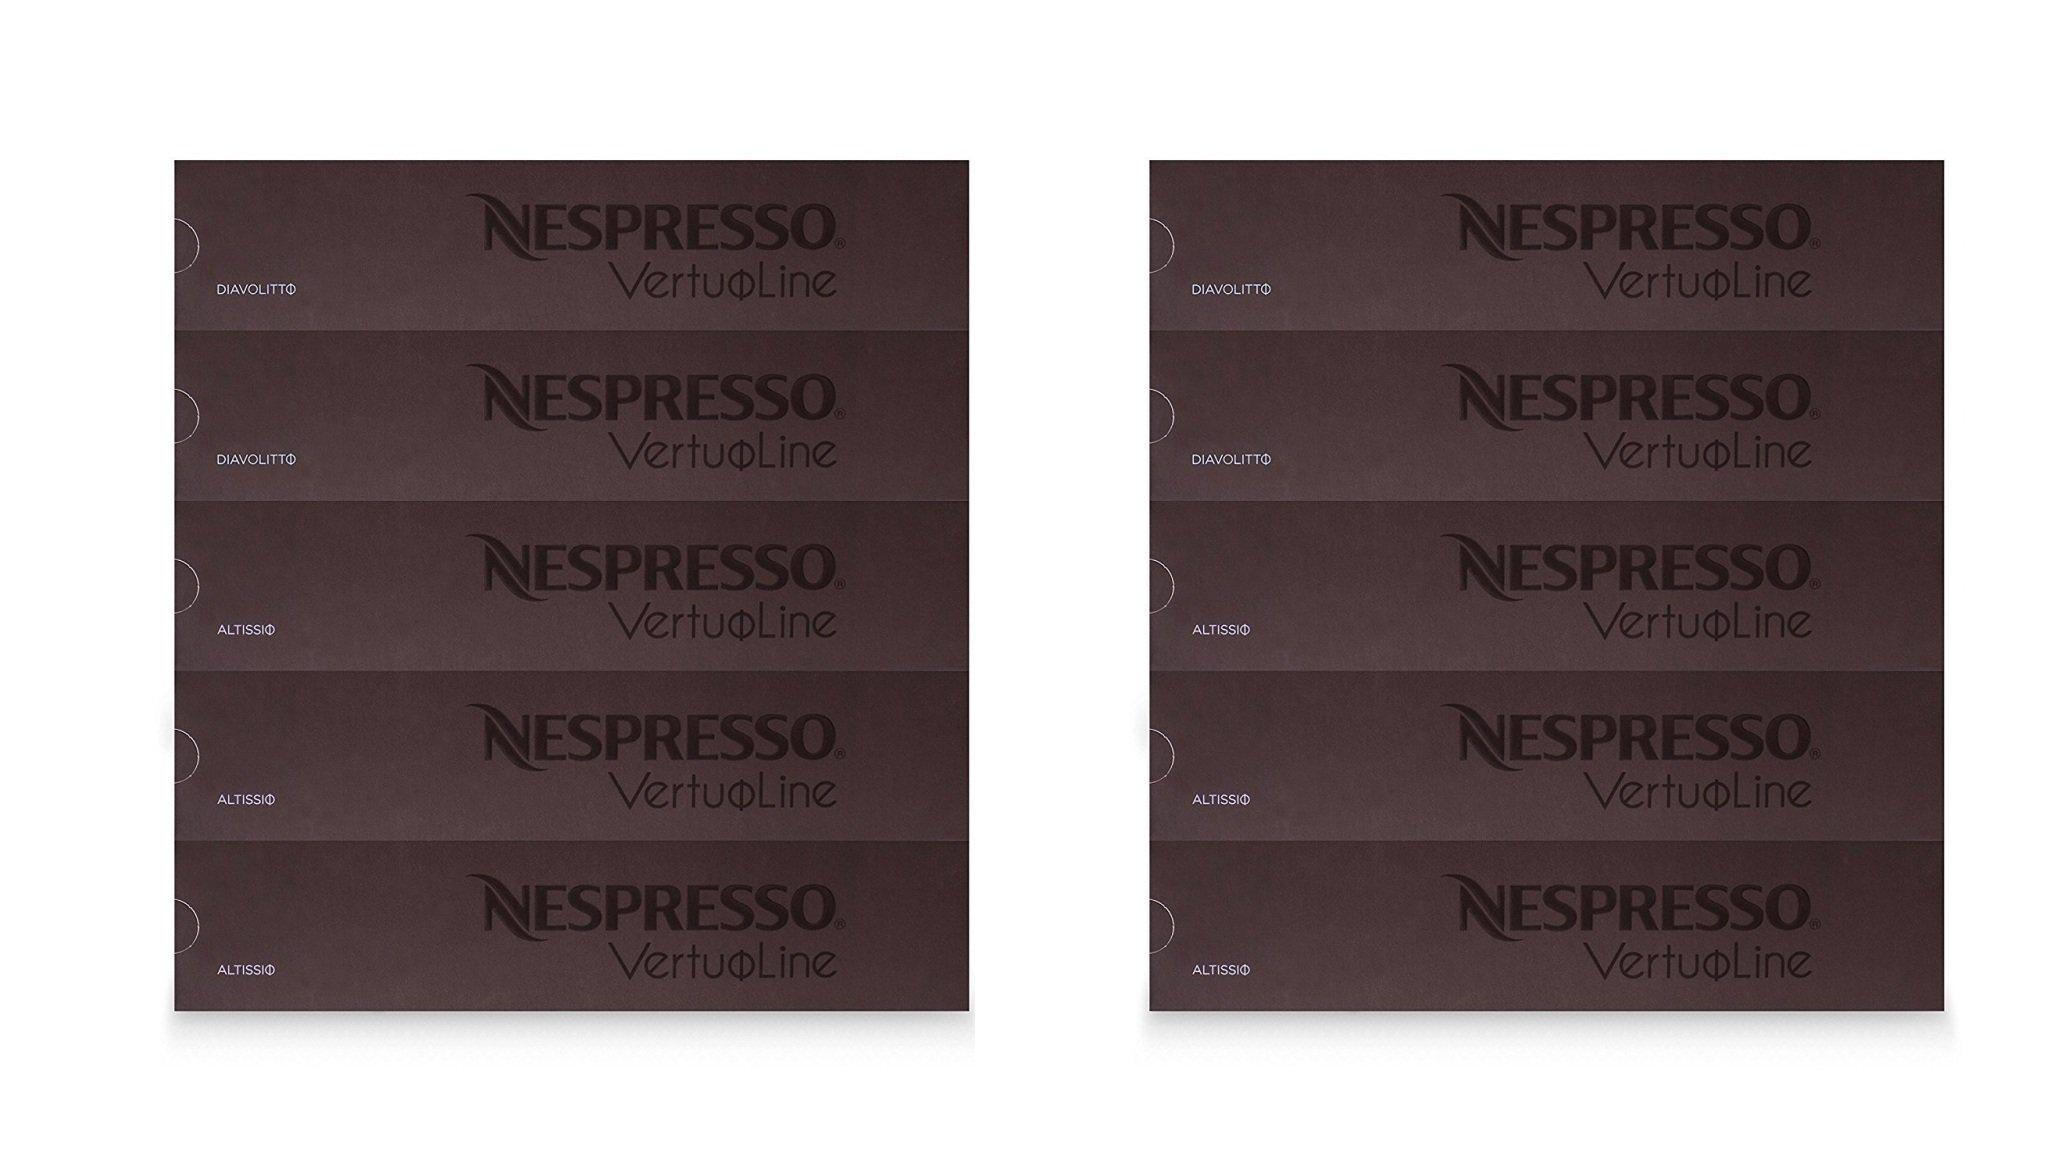 Nespresso Vertuoline Espresso Assortment gzgilB, 2Pack (50 Capsules)